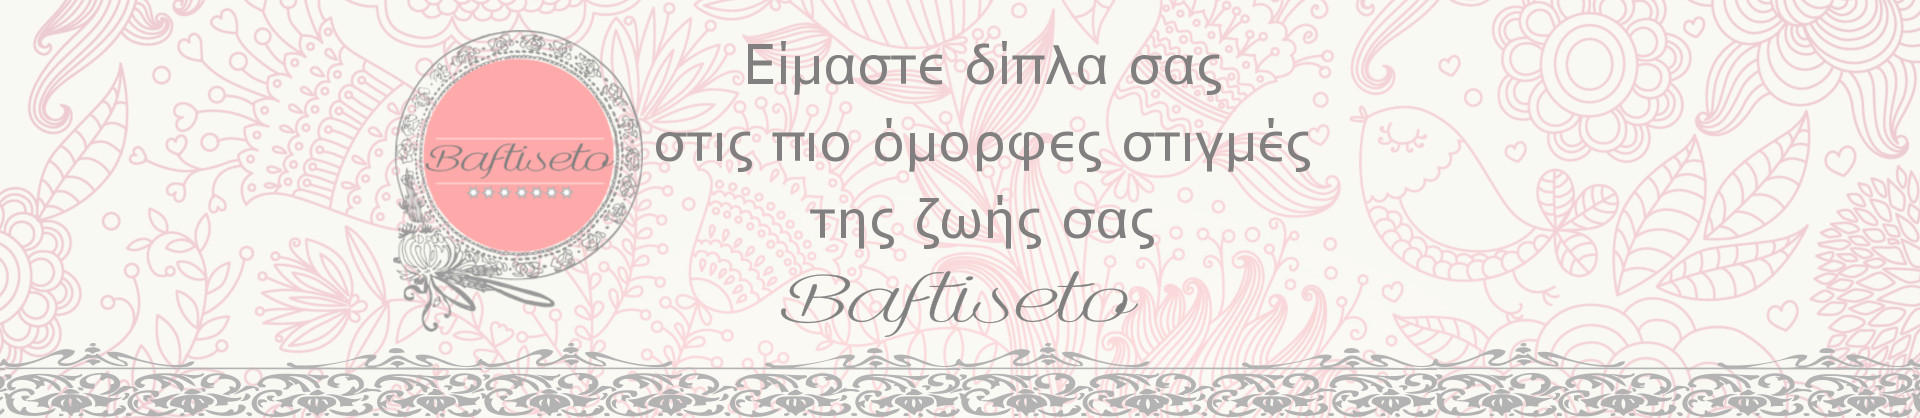 Baftiseto | Είμαστε δίπλα σας στις πιο όμορφες στιγμές της ζωής σας